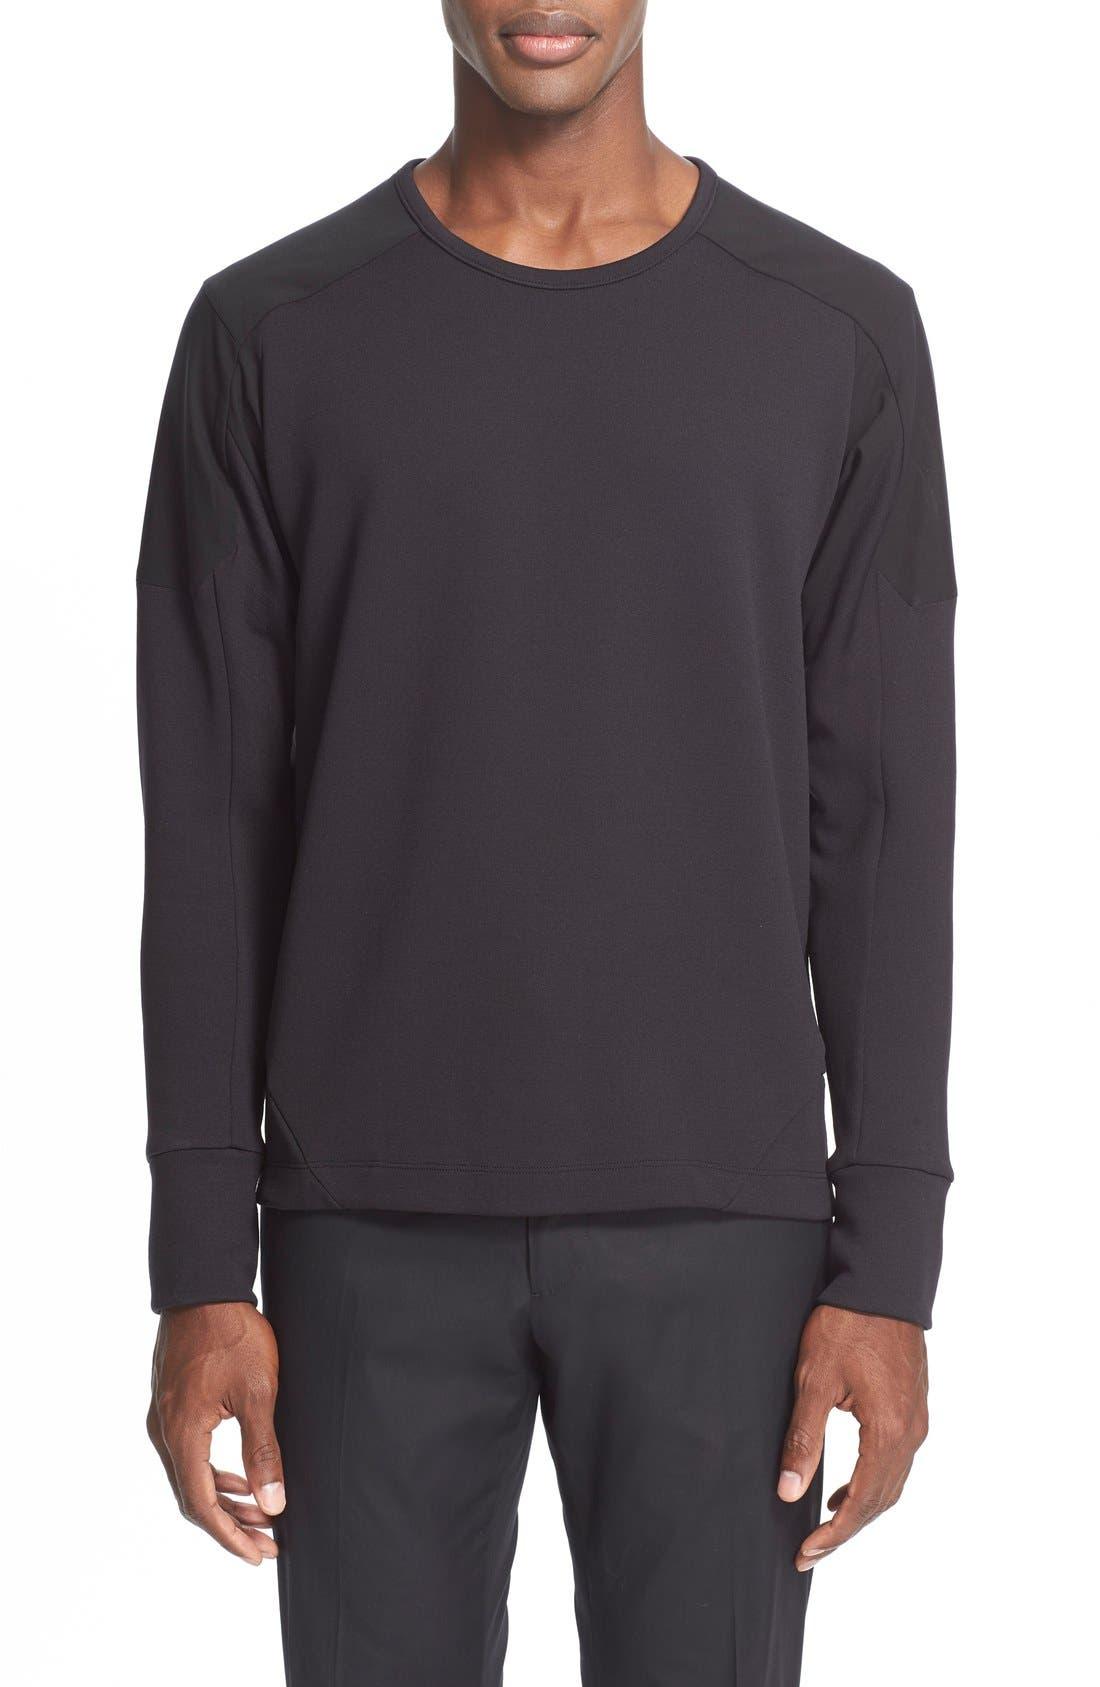 Arc'teryxVeilance'Graph' Sweater